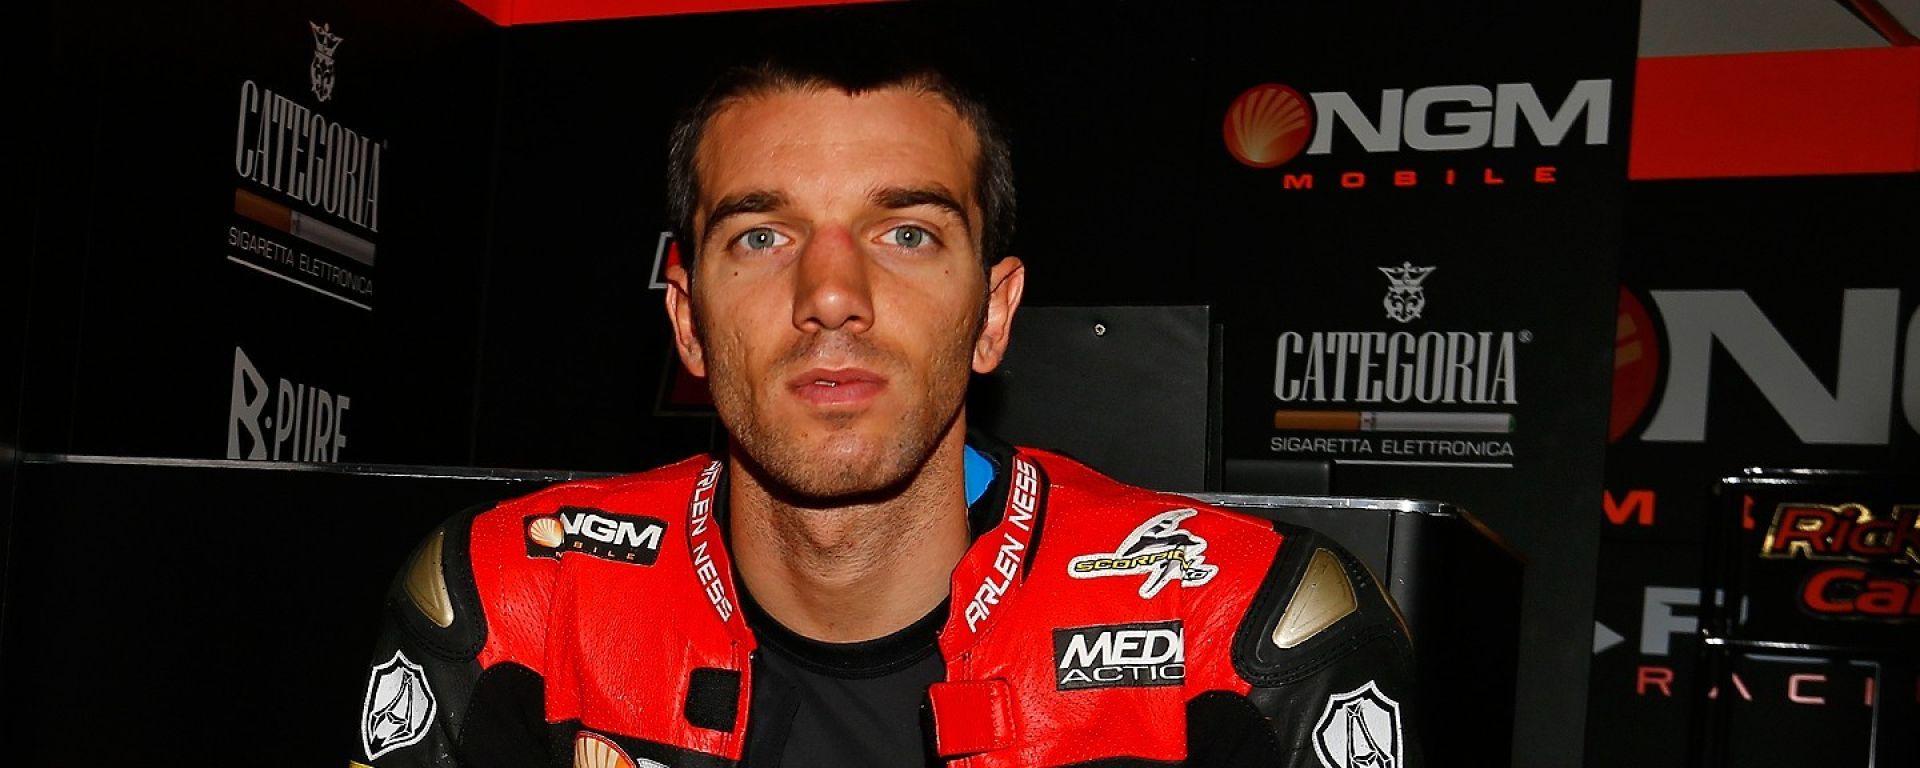 Anche Alex De Angelis nel campionato MotoE